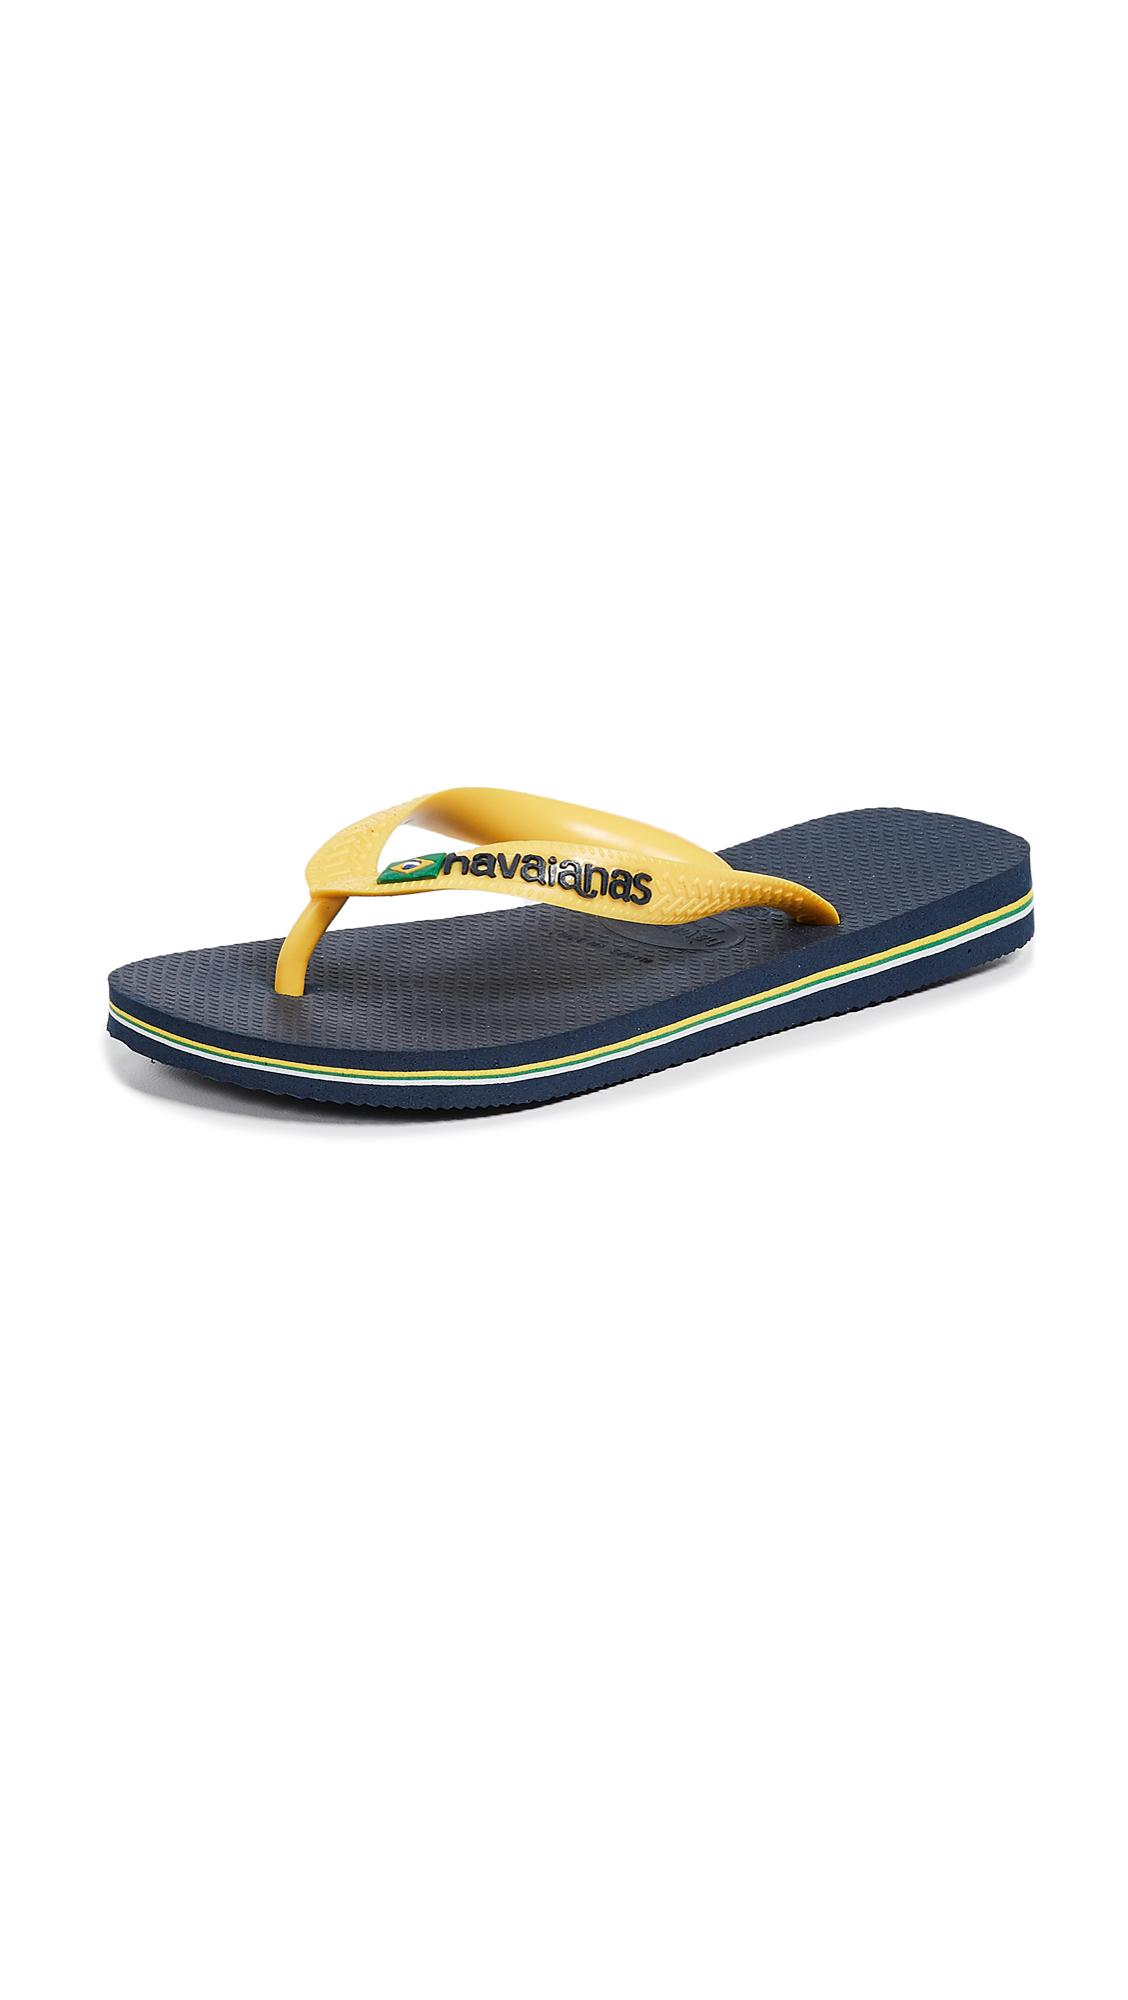 Havaianas Brazil Logo Flip Flops - Navy Blue/Citrus Yellow